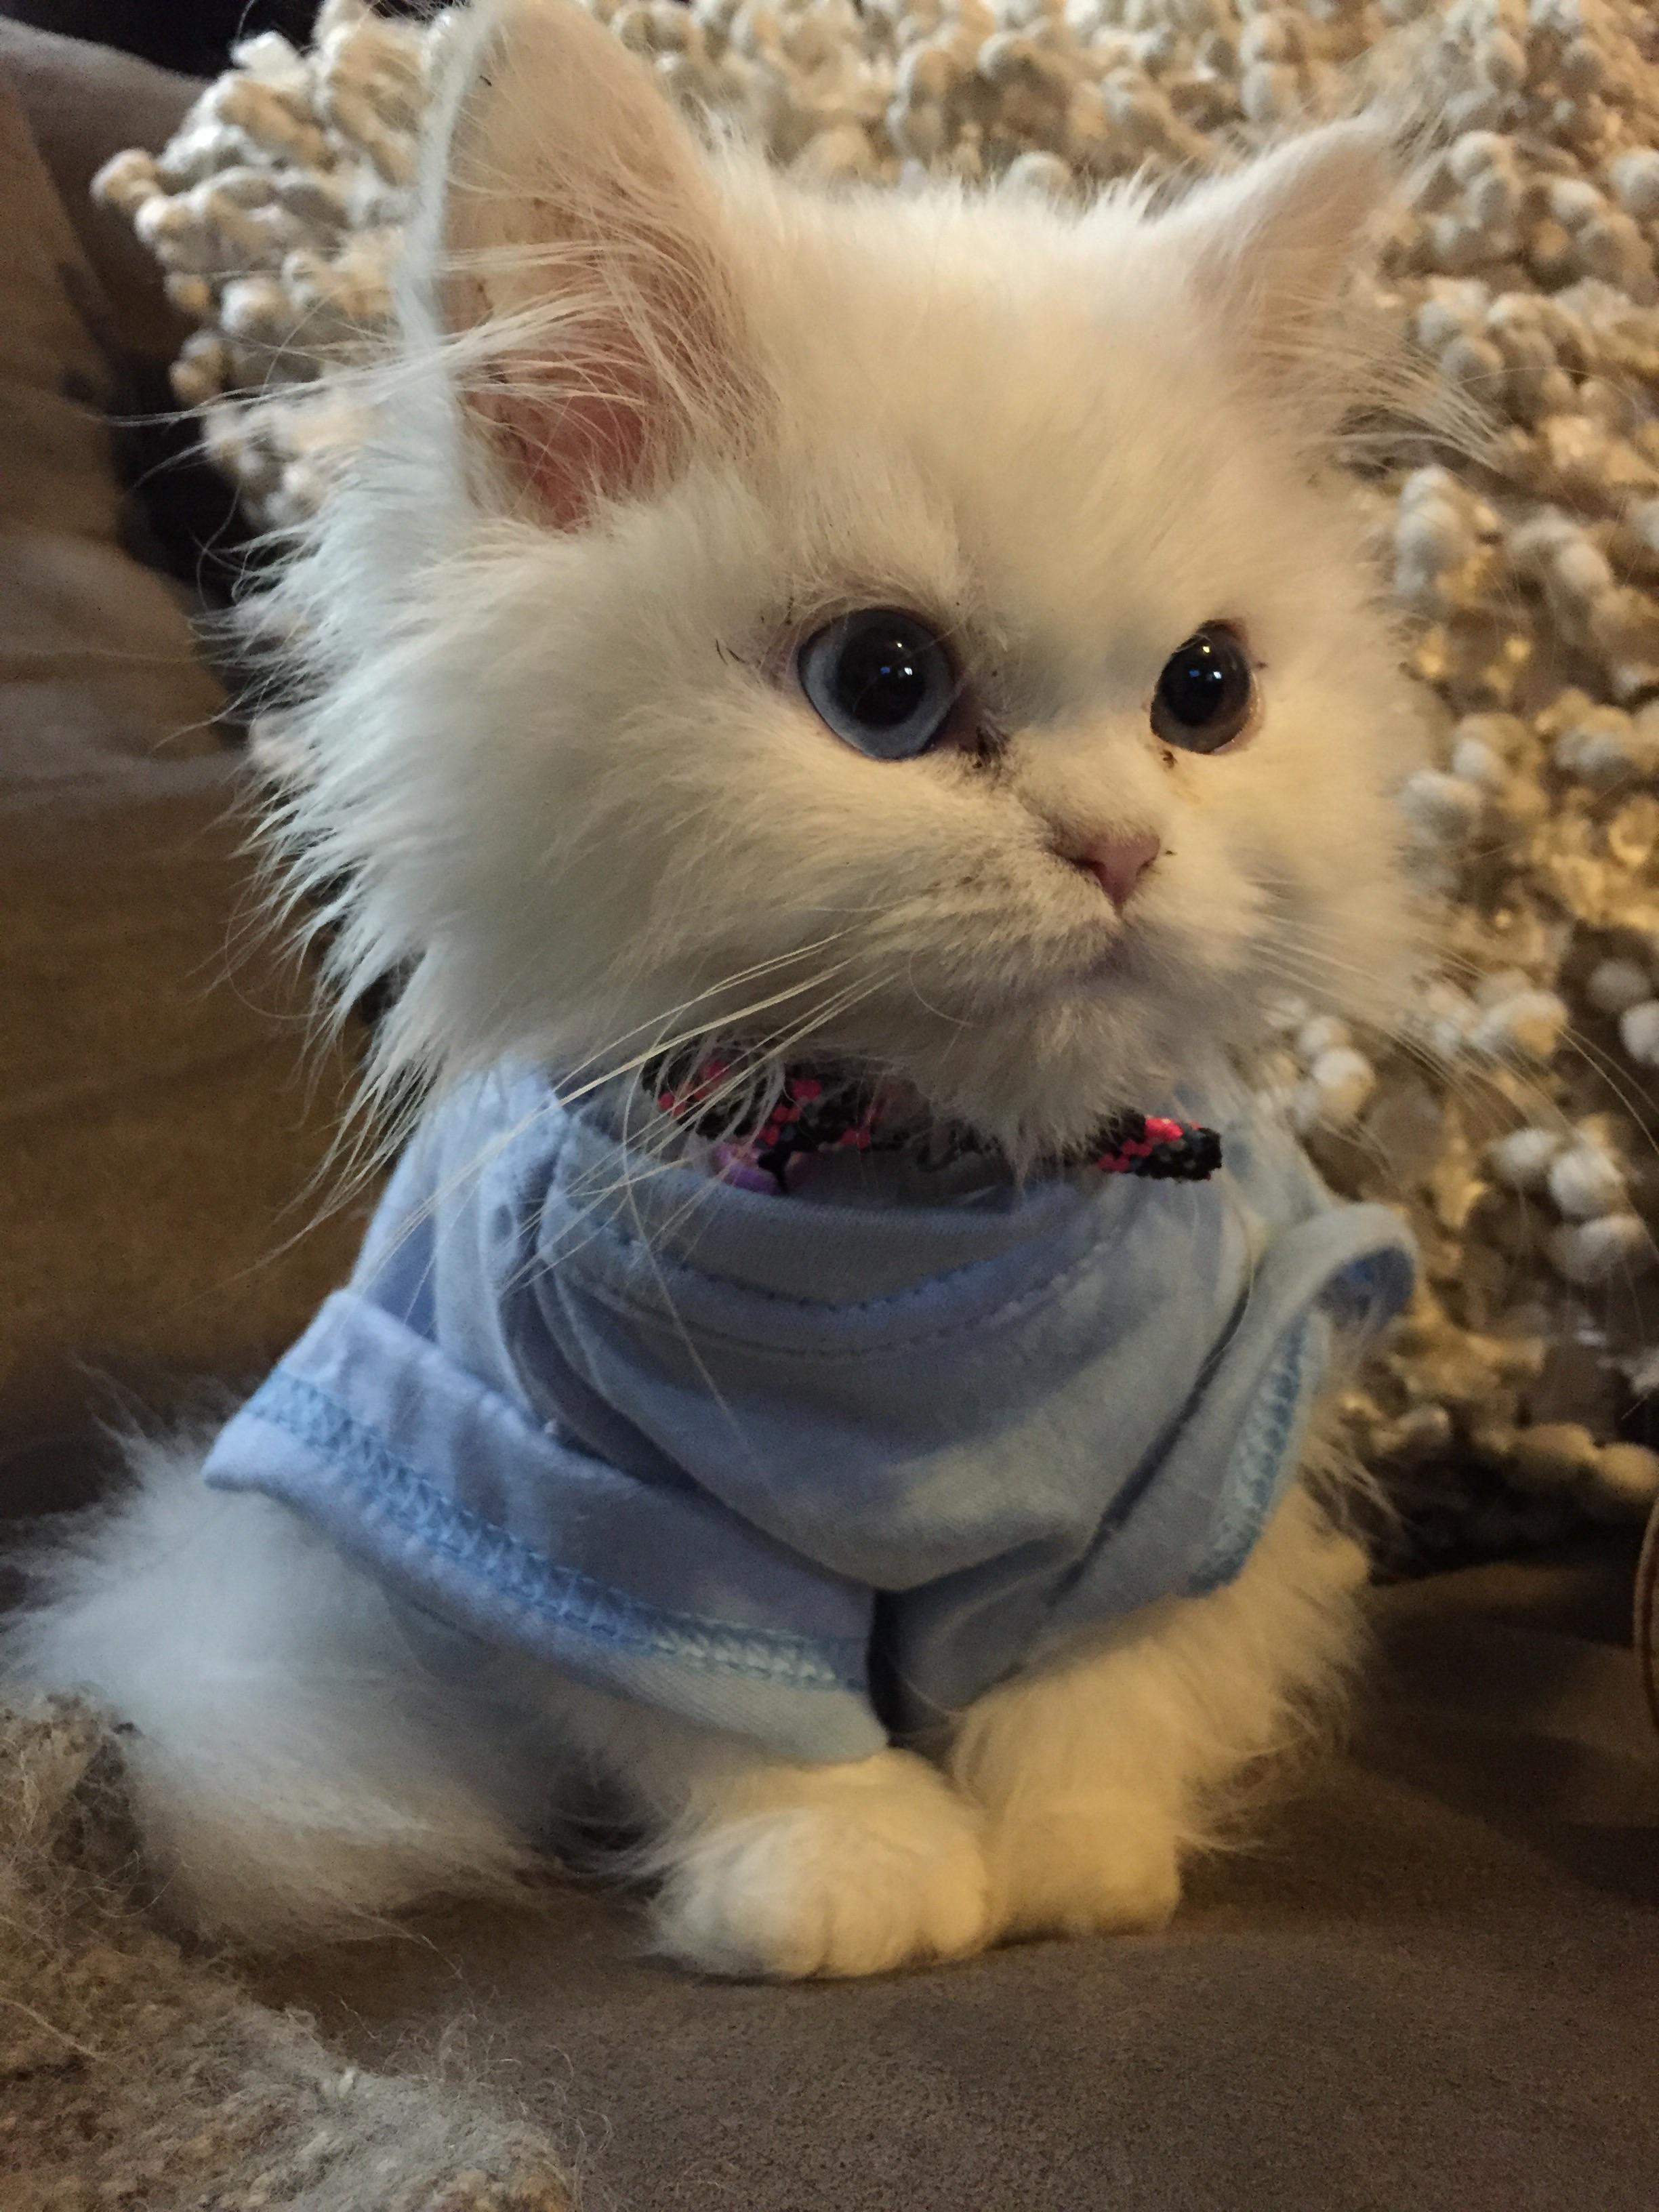 Our New Kitten Kittens Cutest Cute Animals Small Cat Breeds